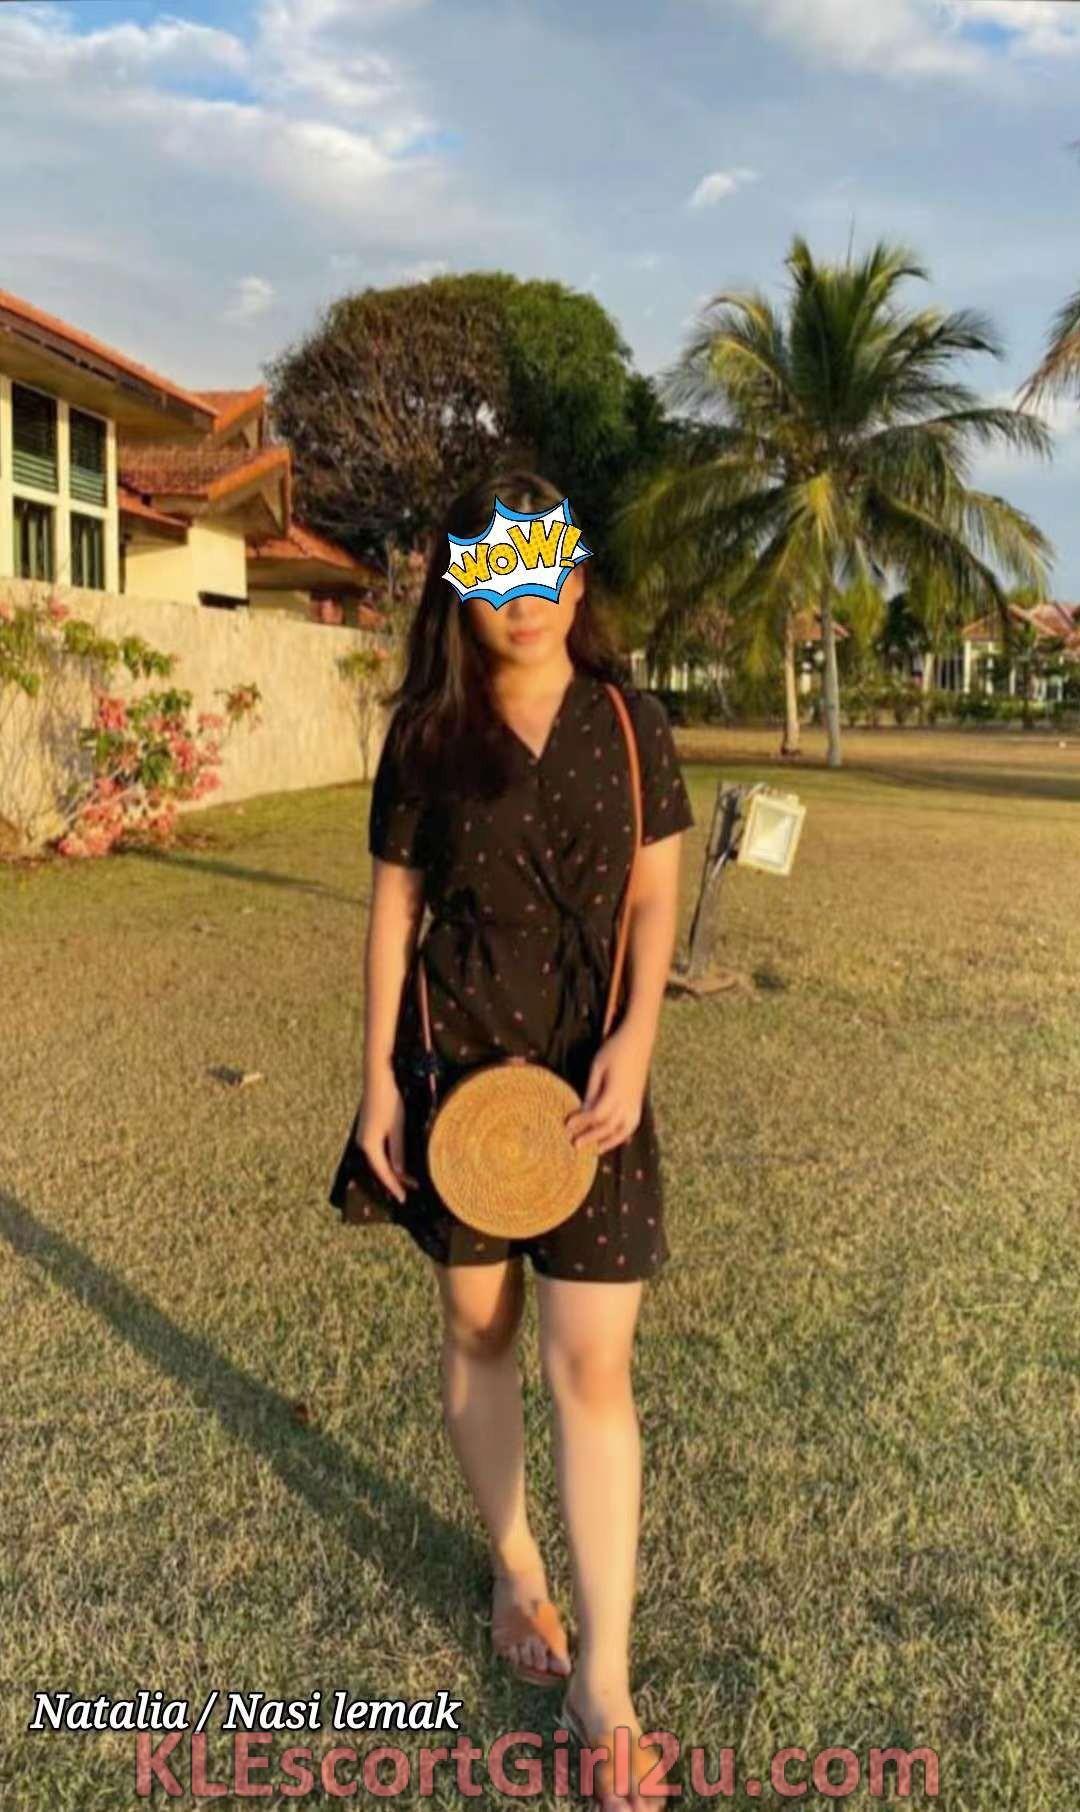 Local Freelance Girl - Malay - Natalie